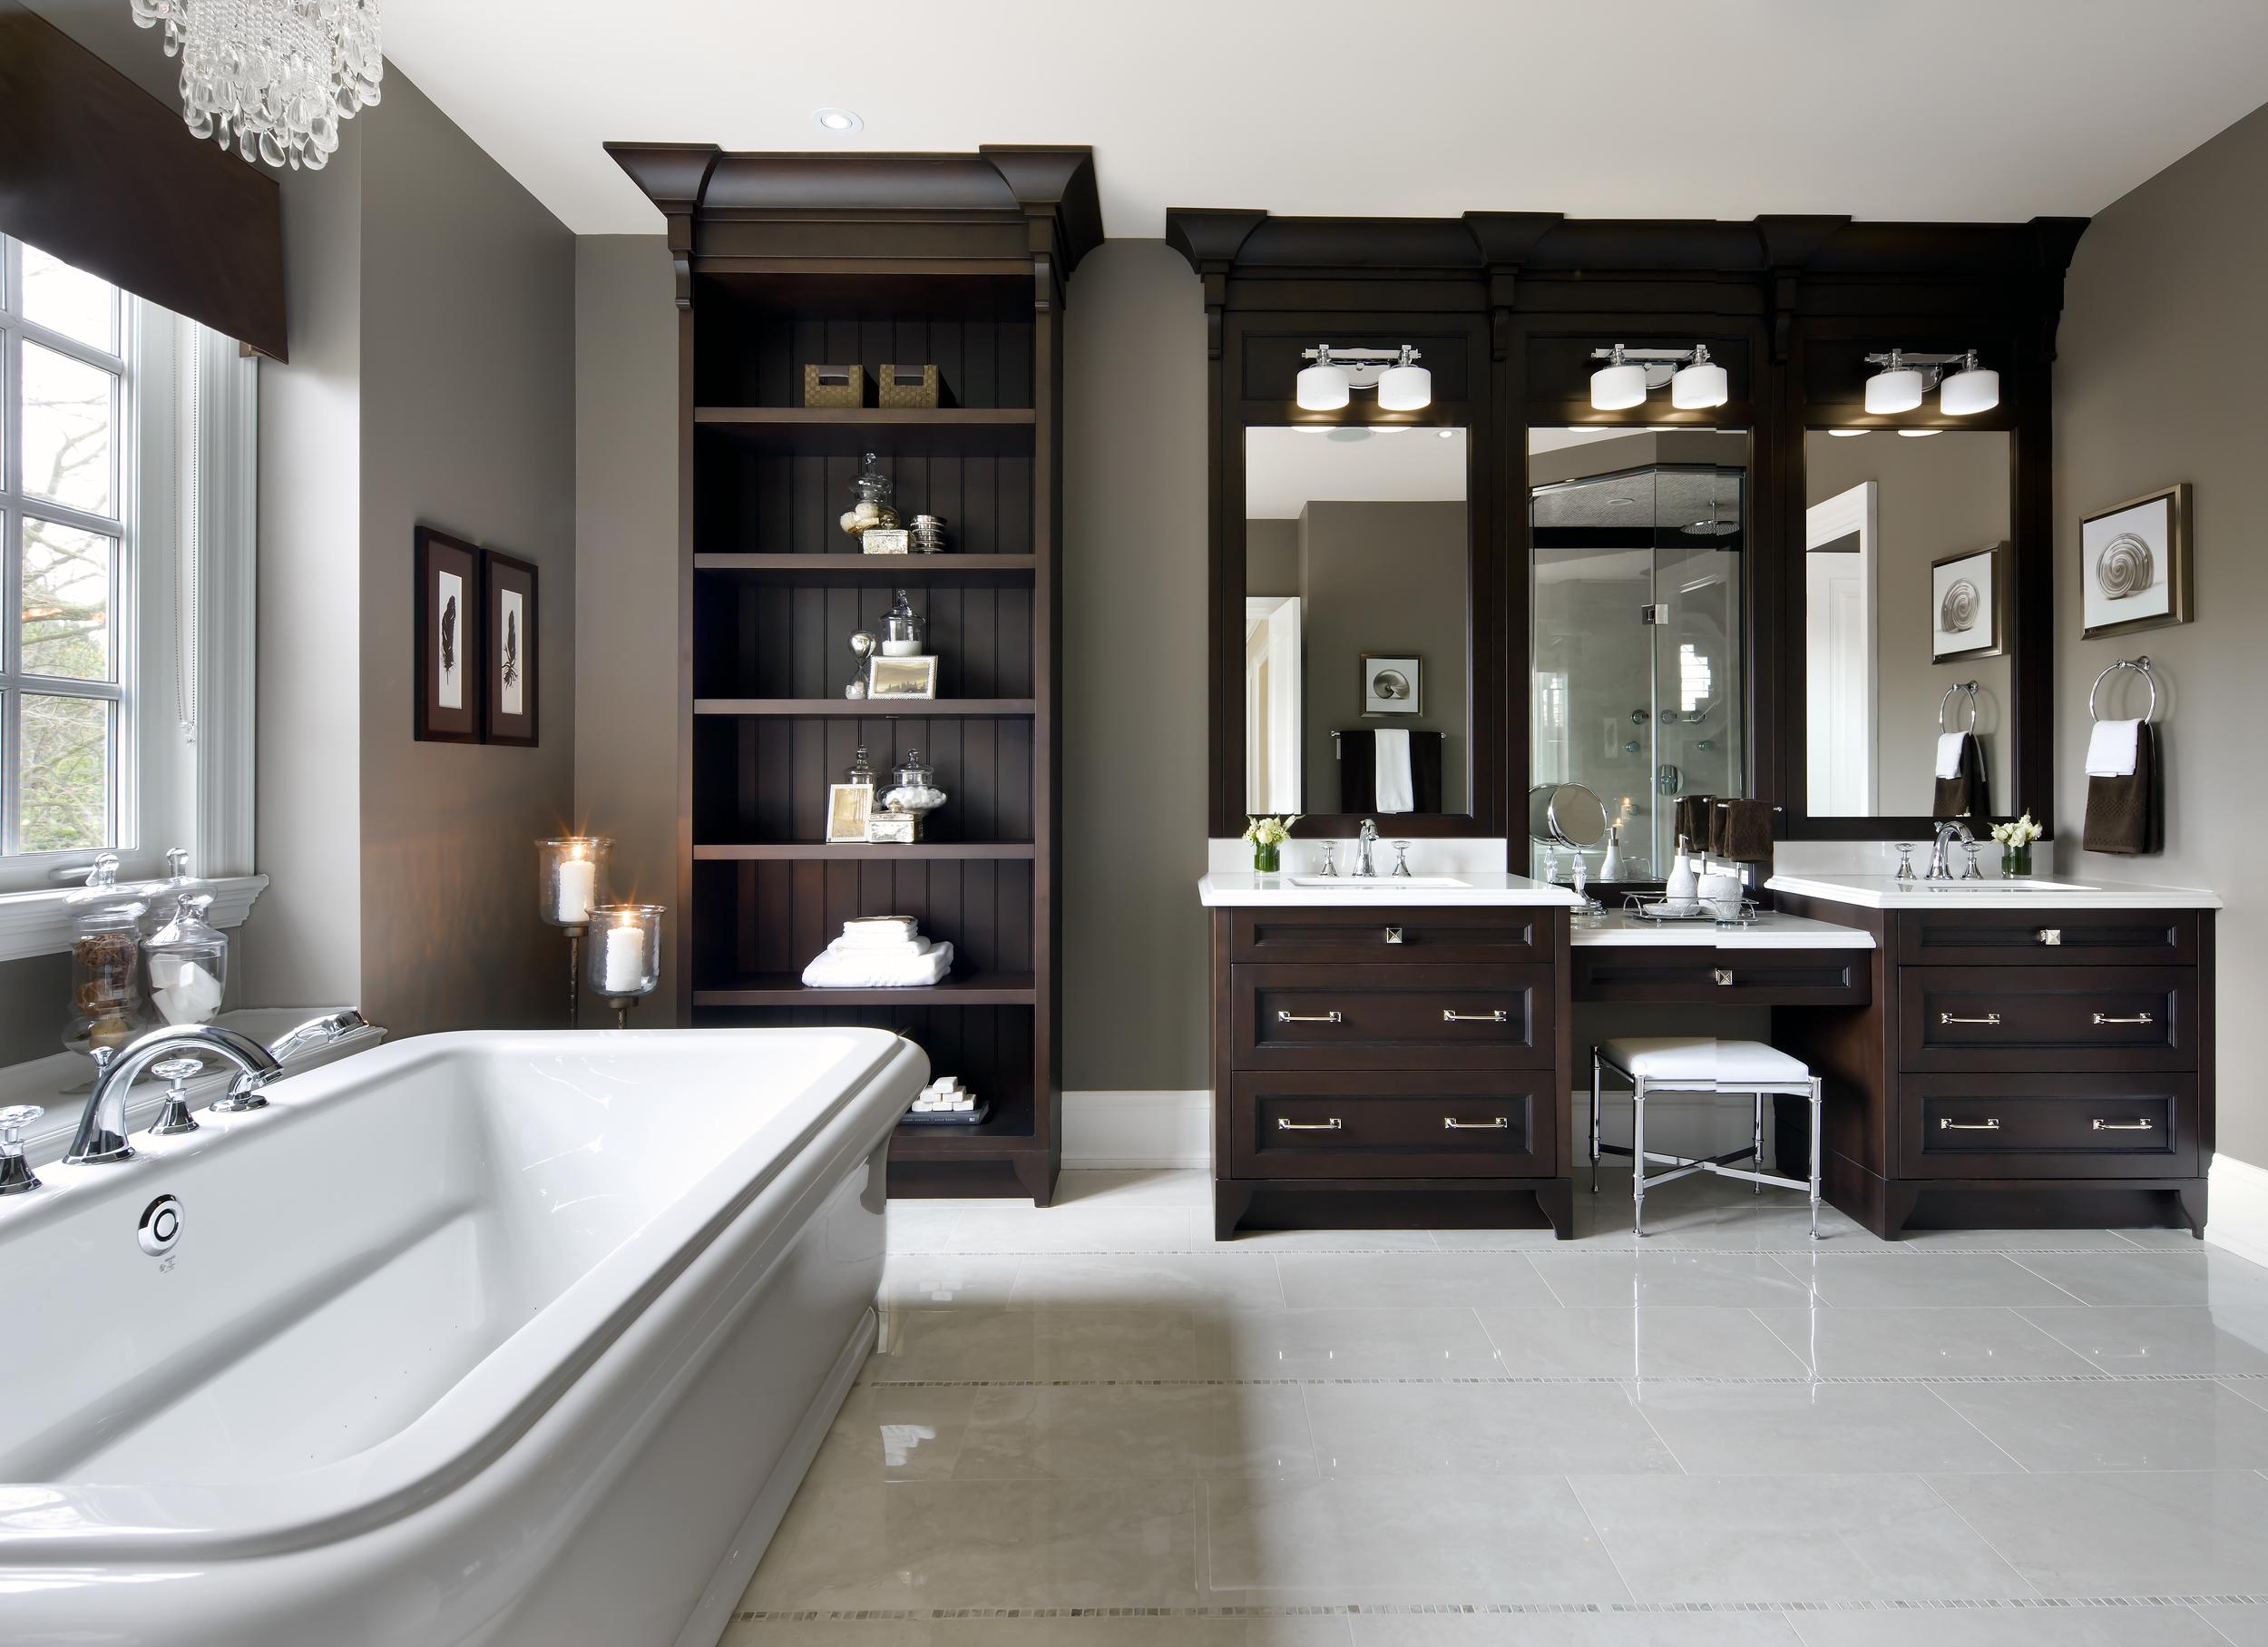 Kylemore Bathroom designed by Jane Lockhart